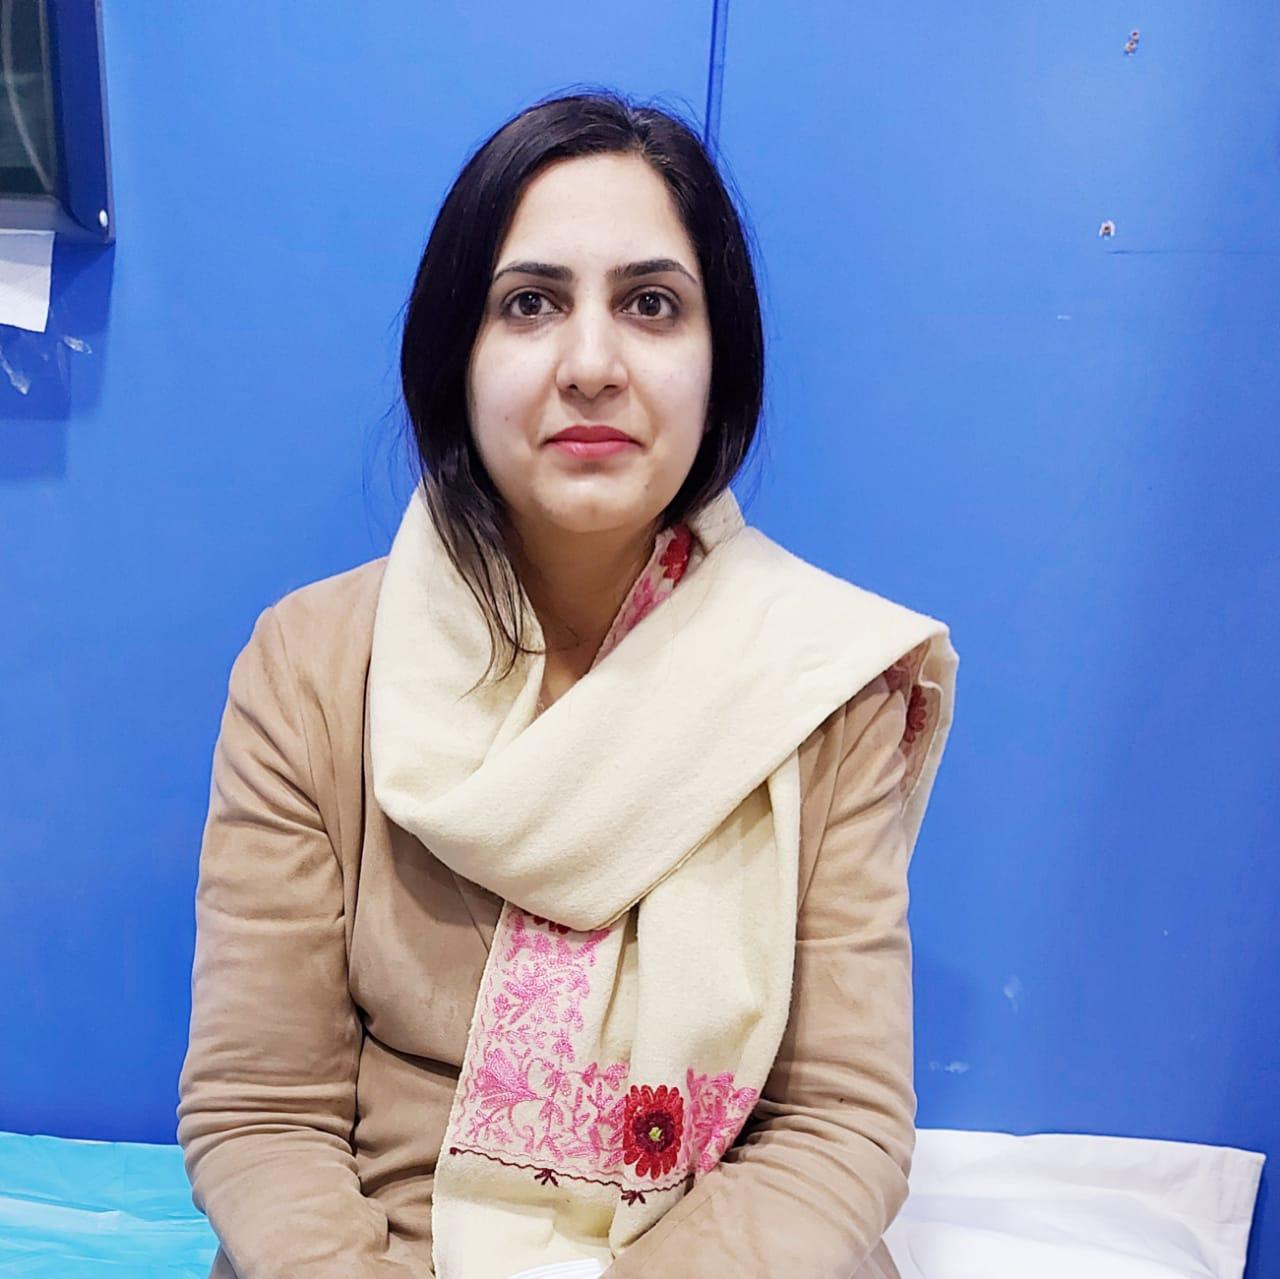 Dr. Memoona Khalood